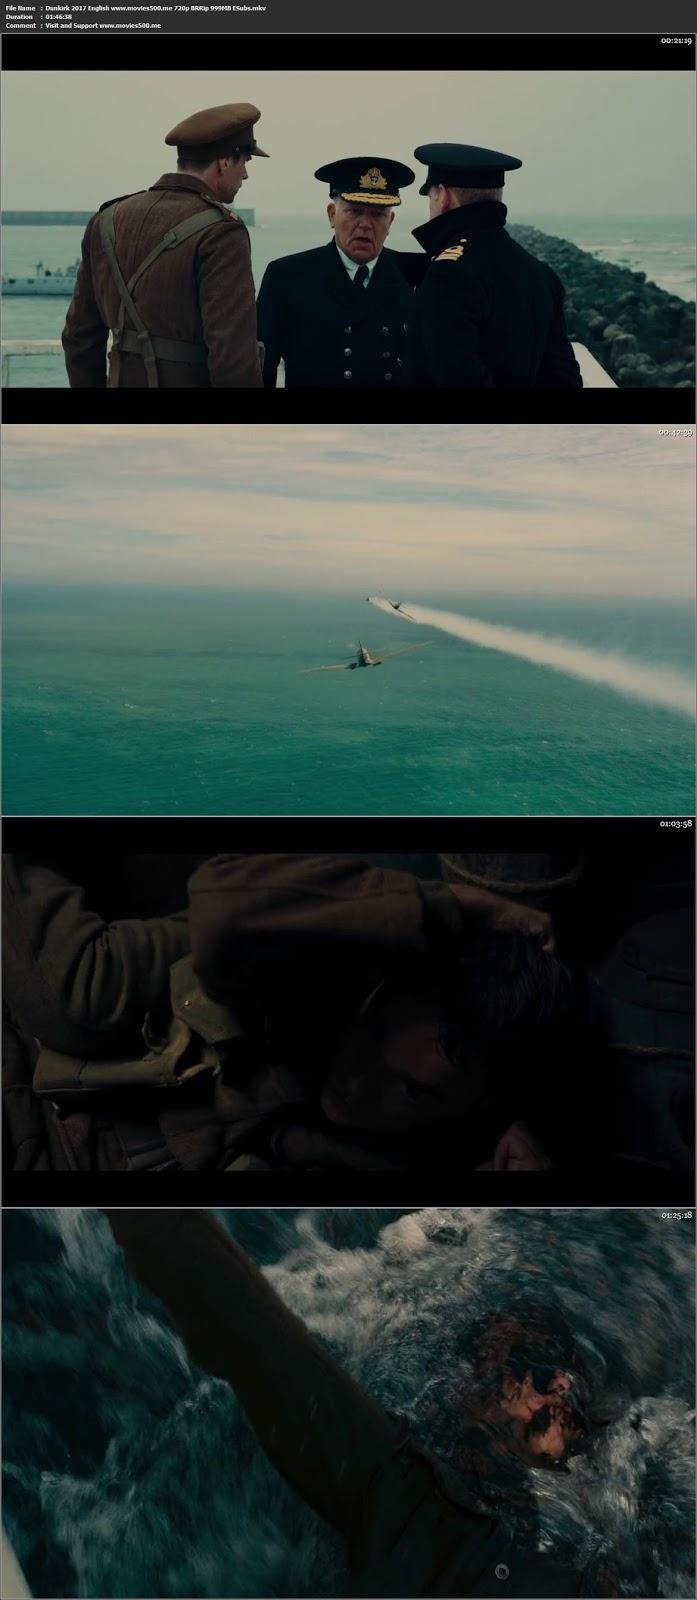 Dunkirk 2017 English Full Movie BRRip 720p 1GB at freedomcopy.com